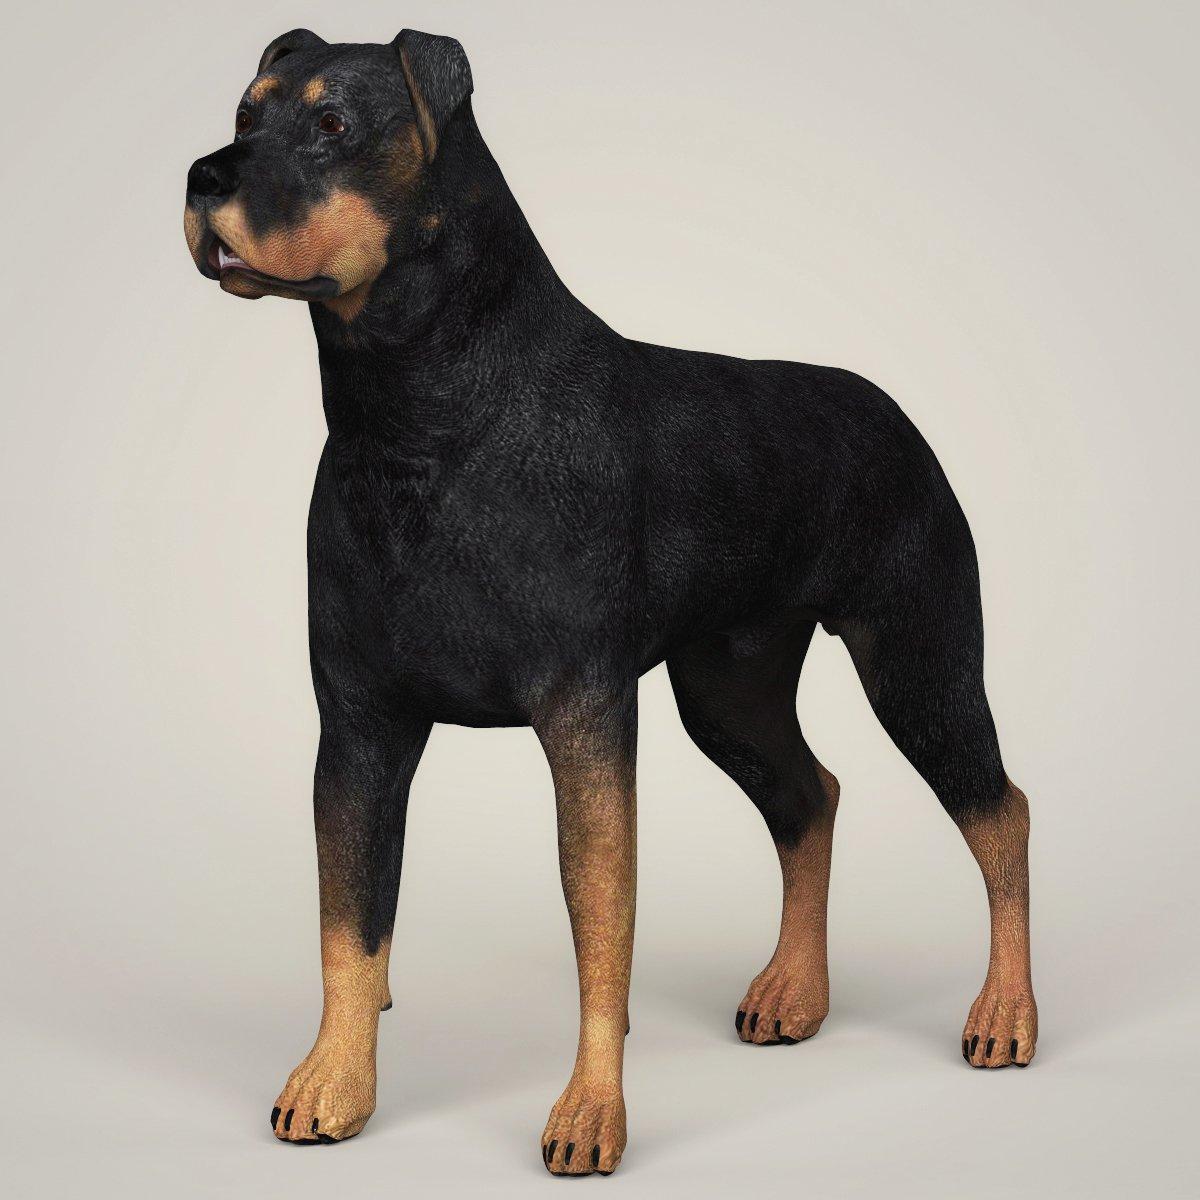 Realistic Rottweiler Dog 3D Model in Dog 3DExport